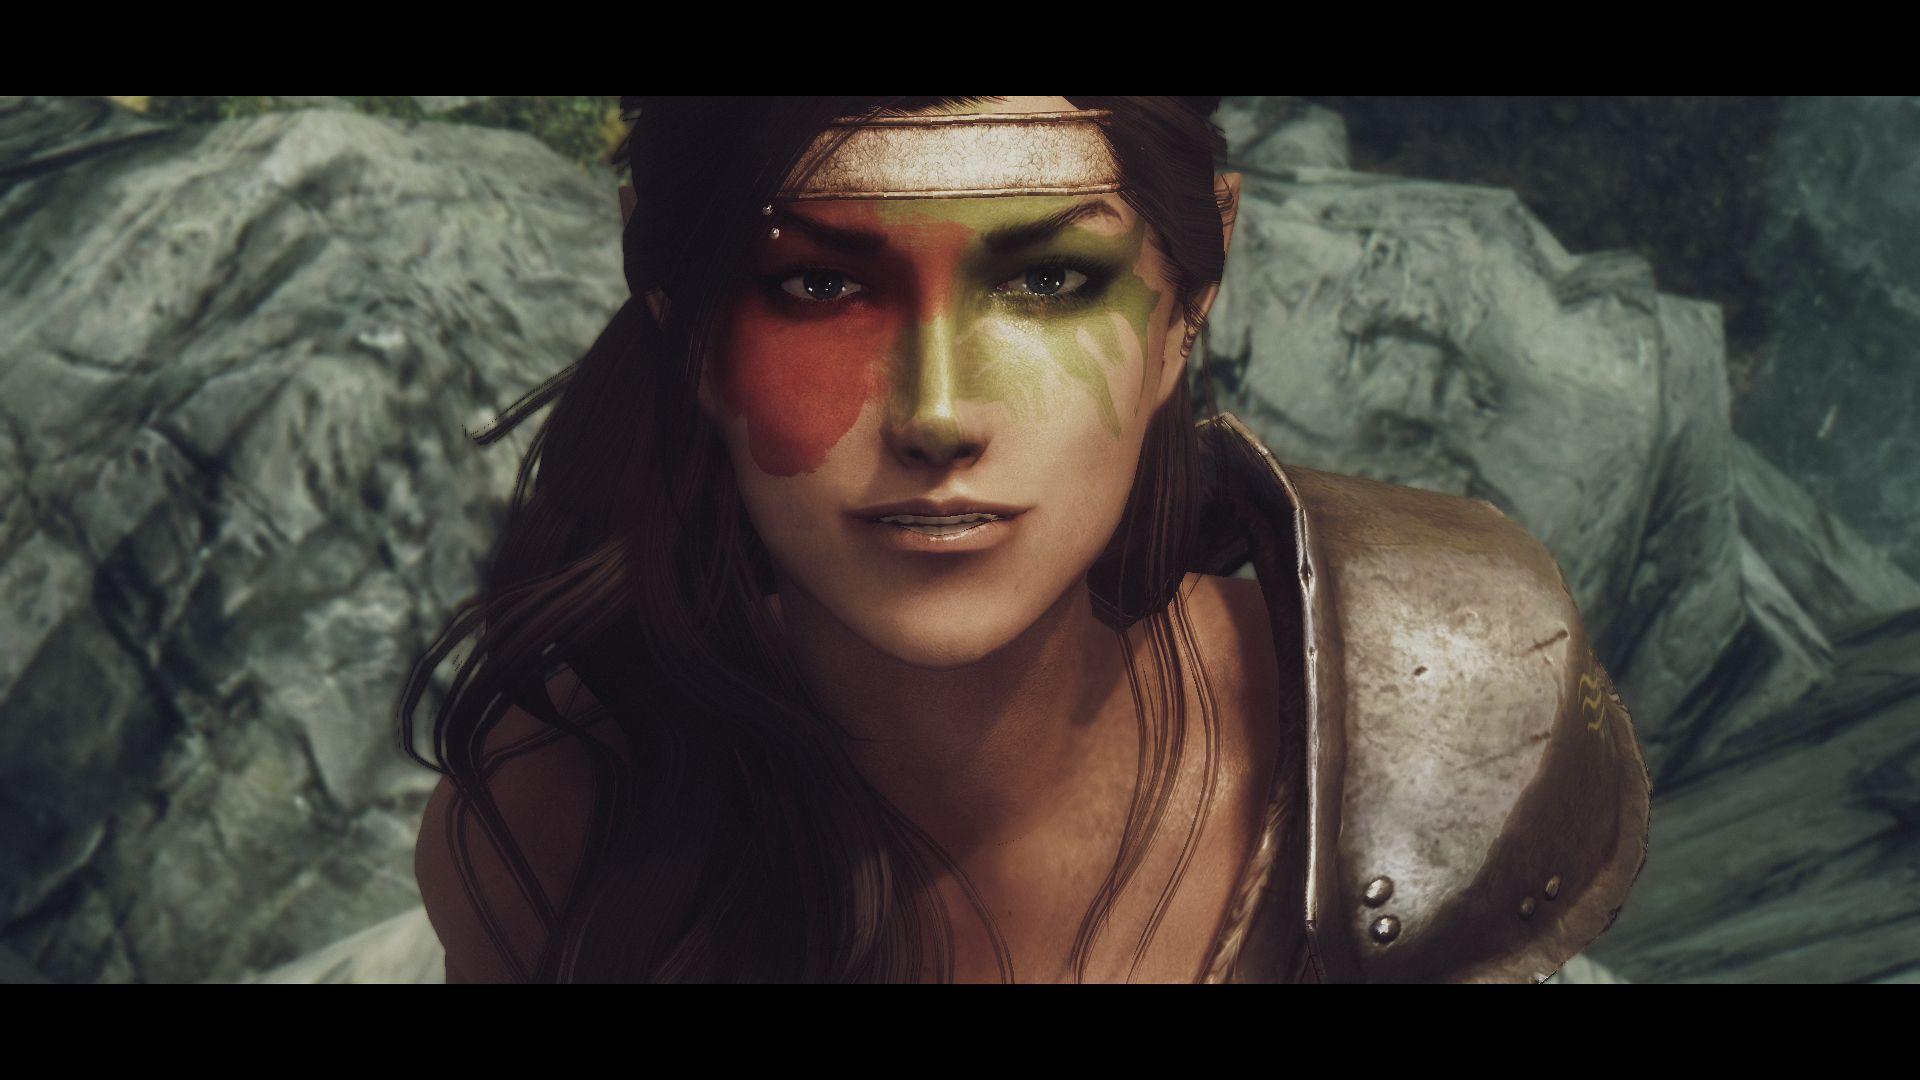 half-elf   Face of a Half-Elf   Elves   Skyrim mods, Best